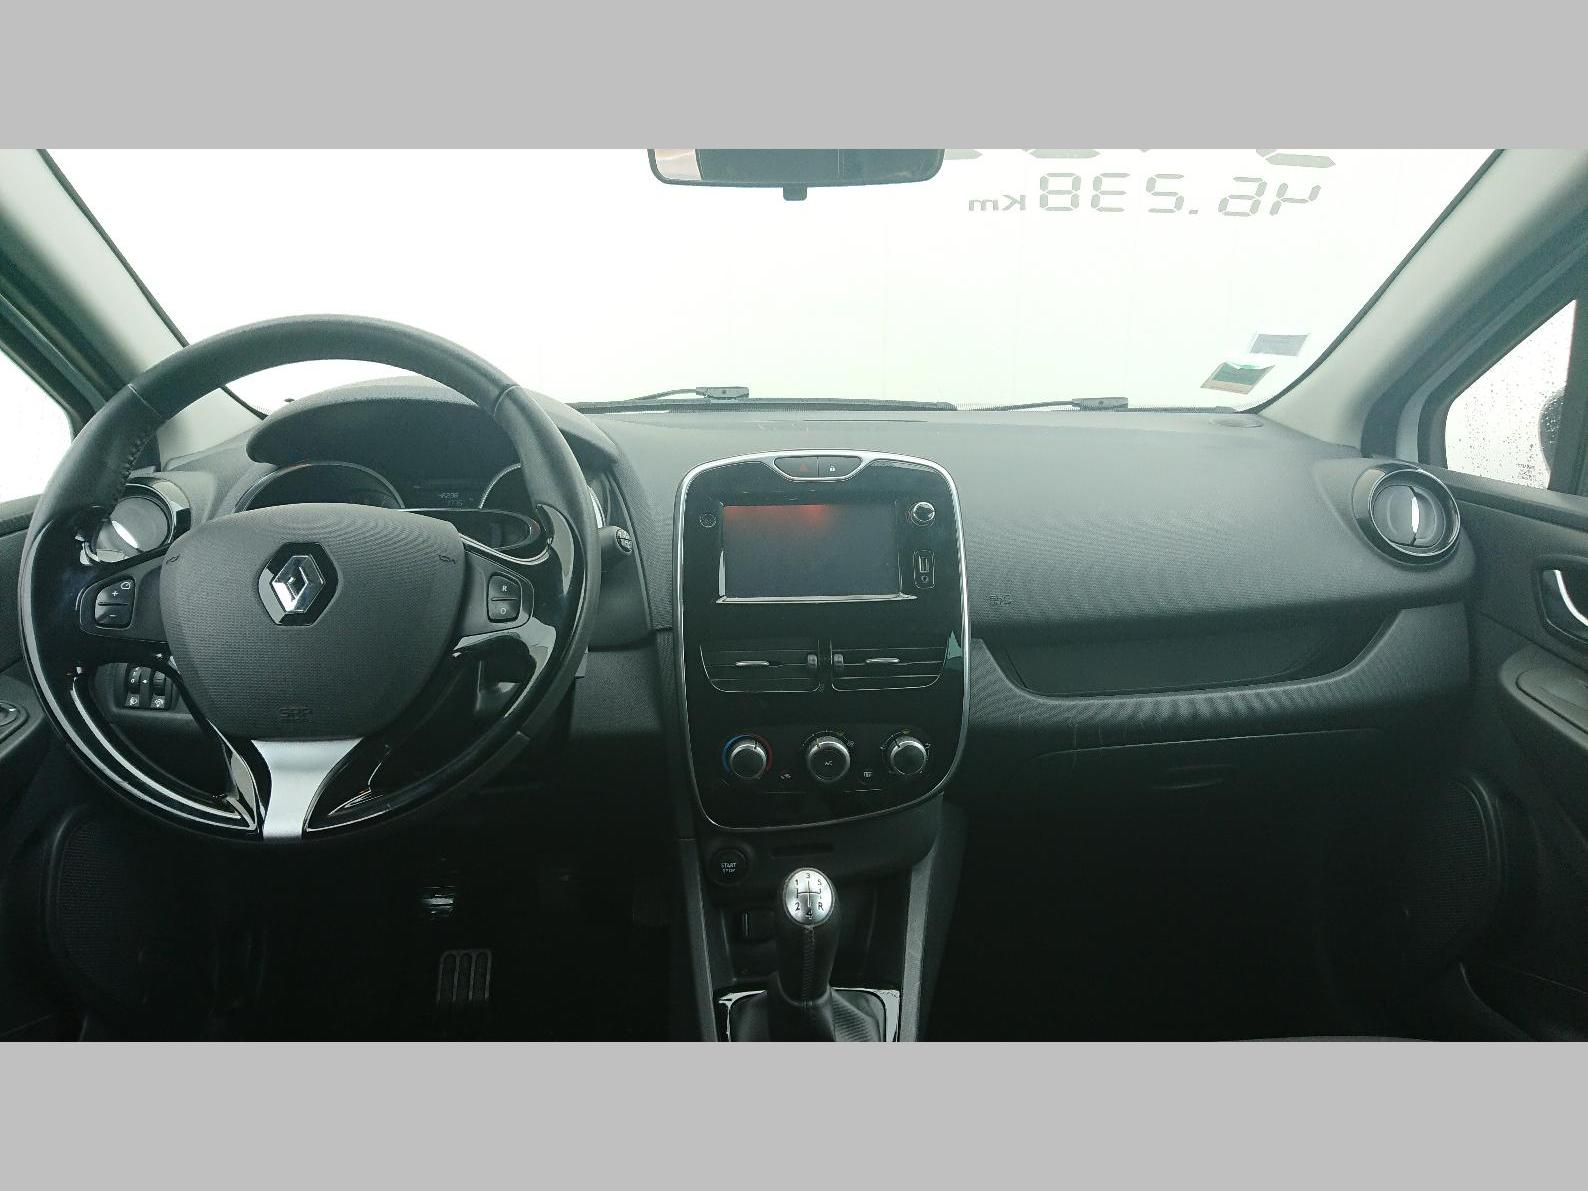 RENAULT CLIO IV Clio IV 1.2 16V 75 Limited